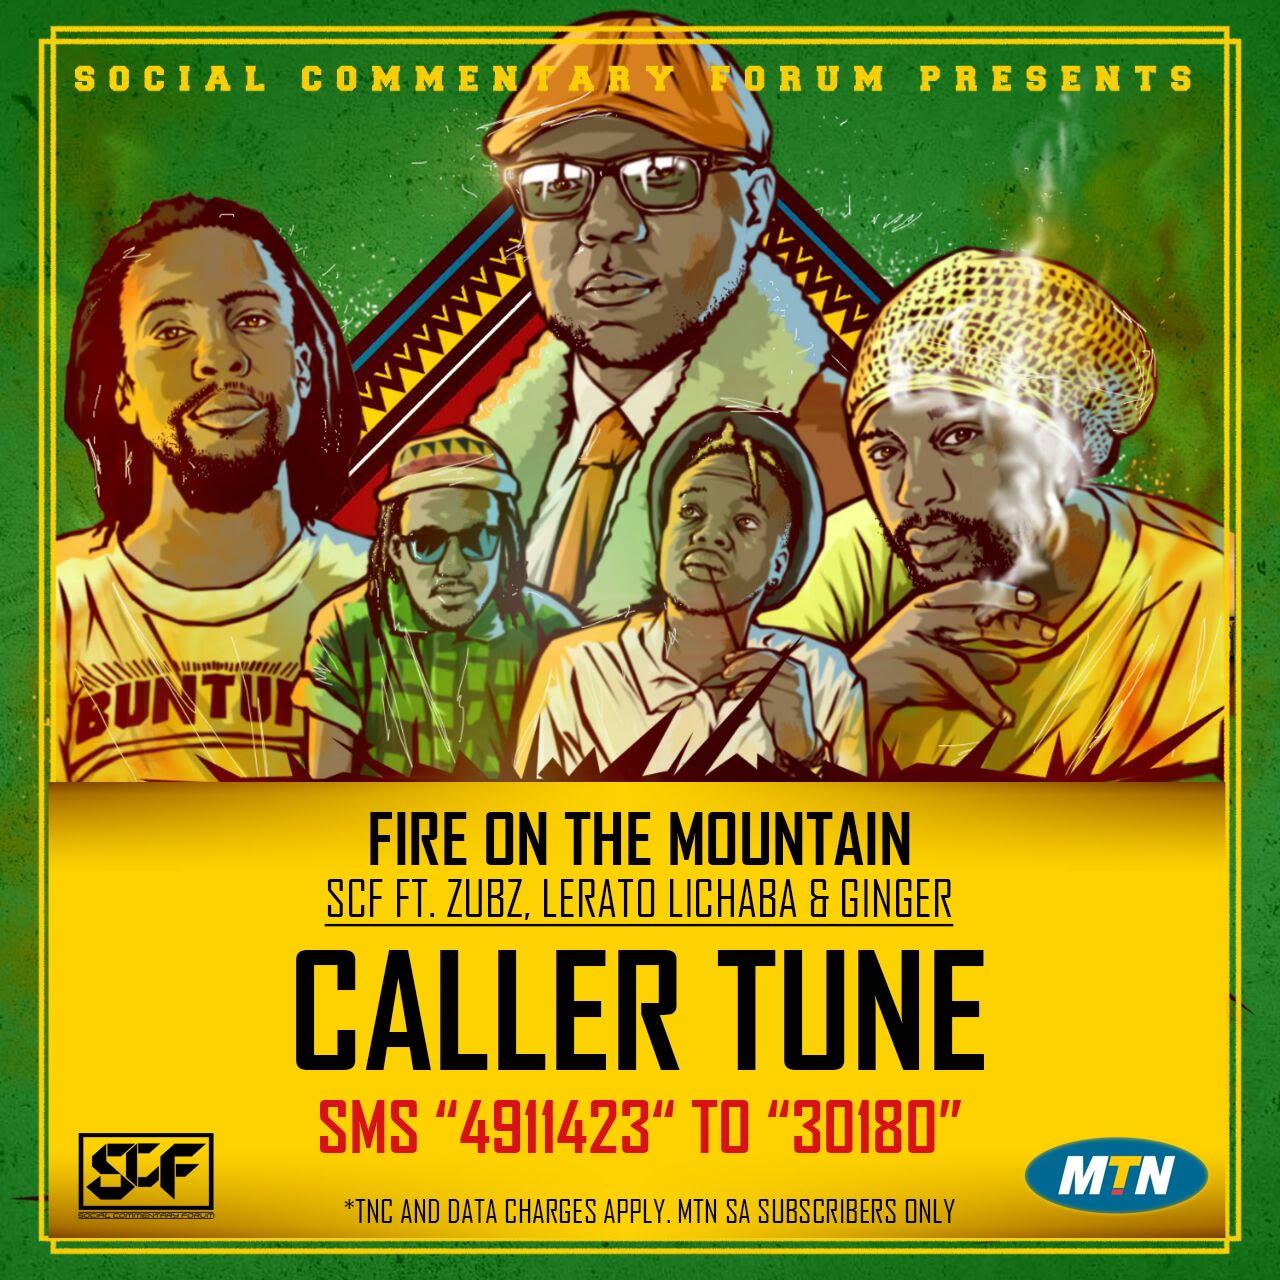 MTN Caller Tune